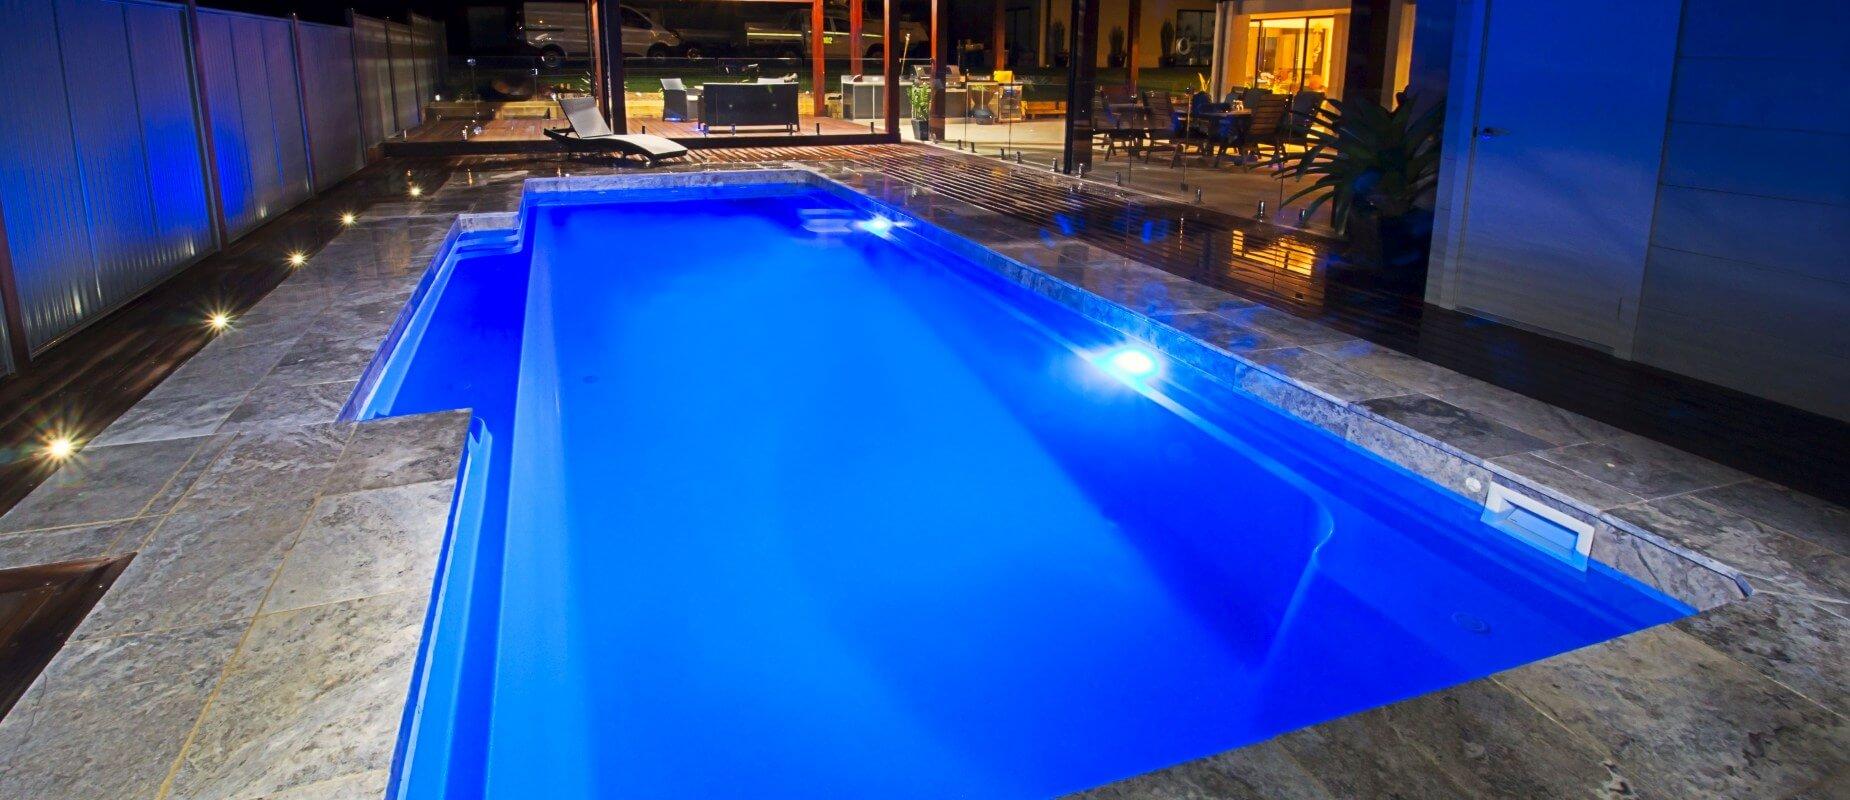 piscina de lux modele frumoase 25